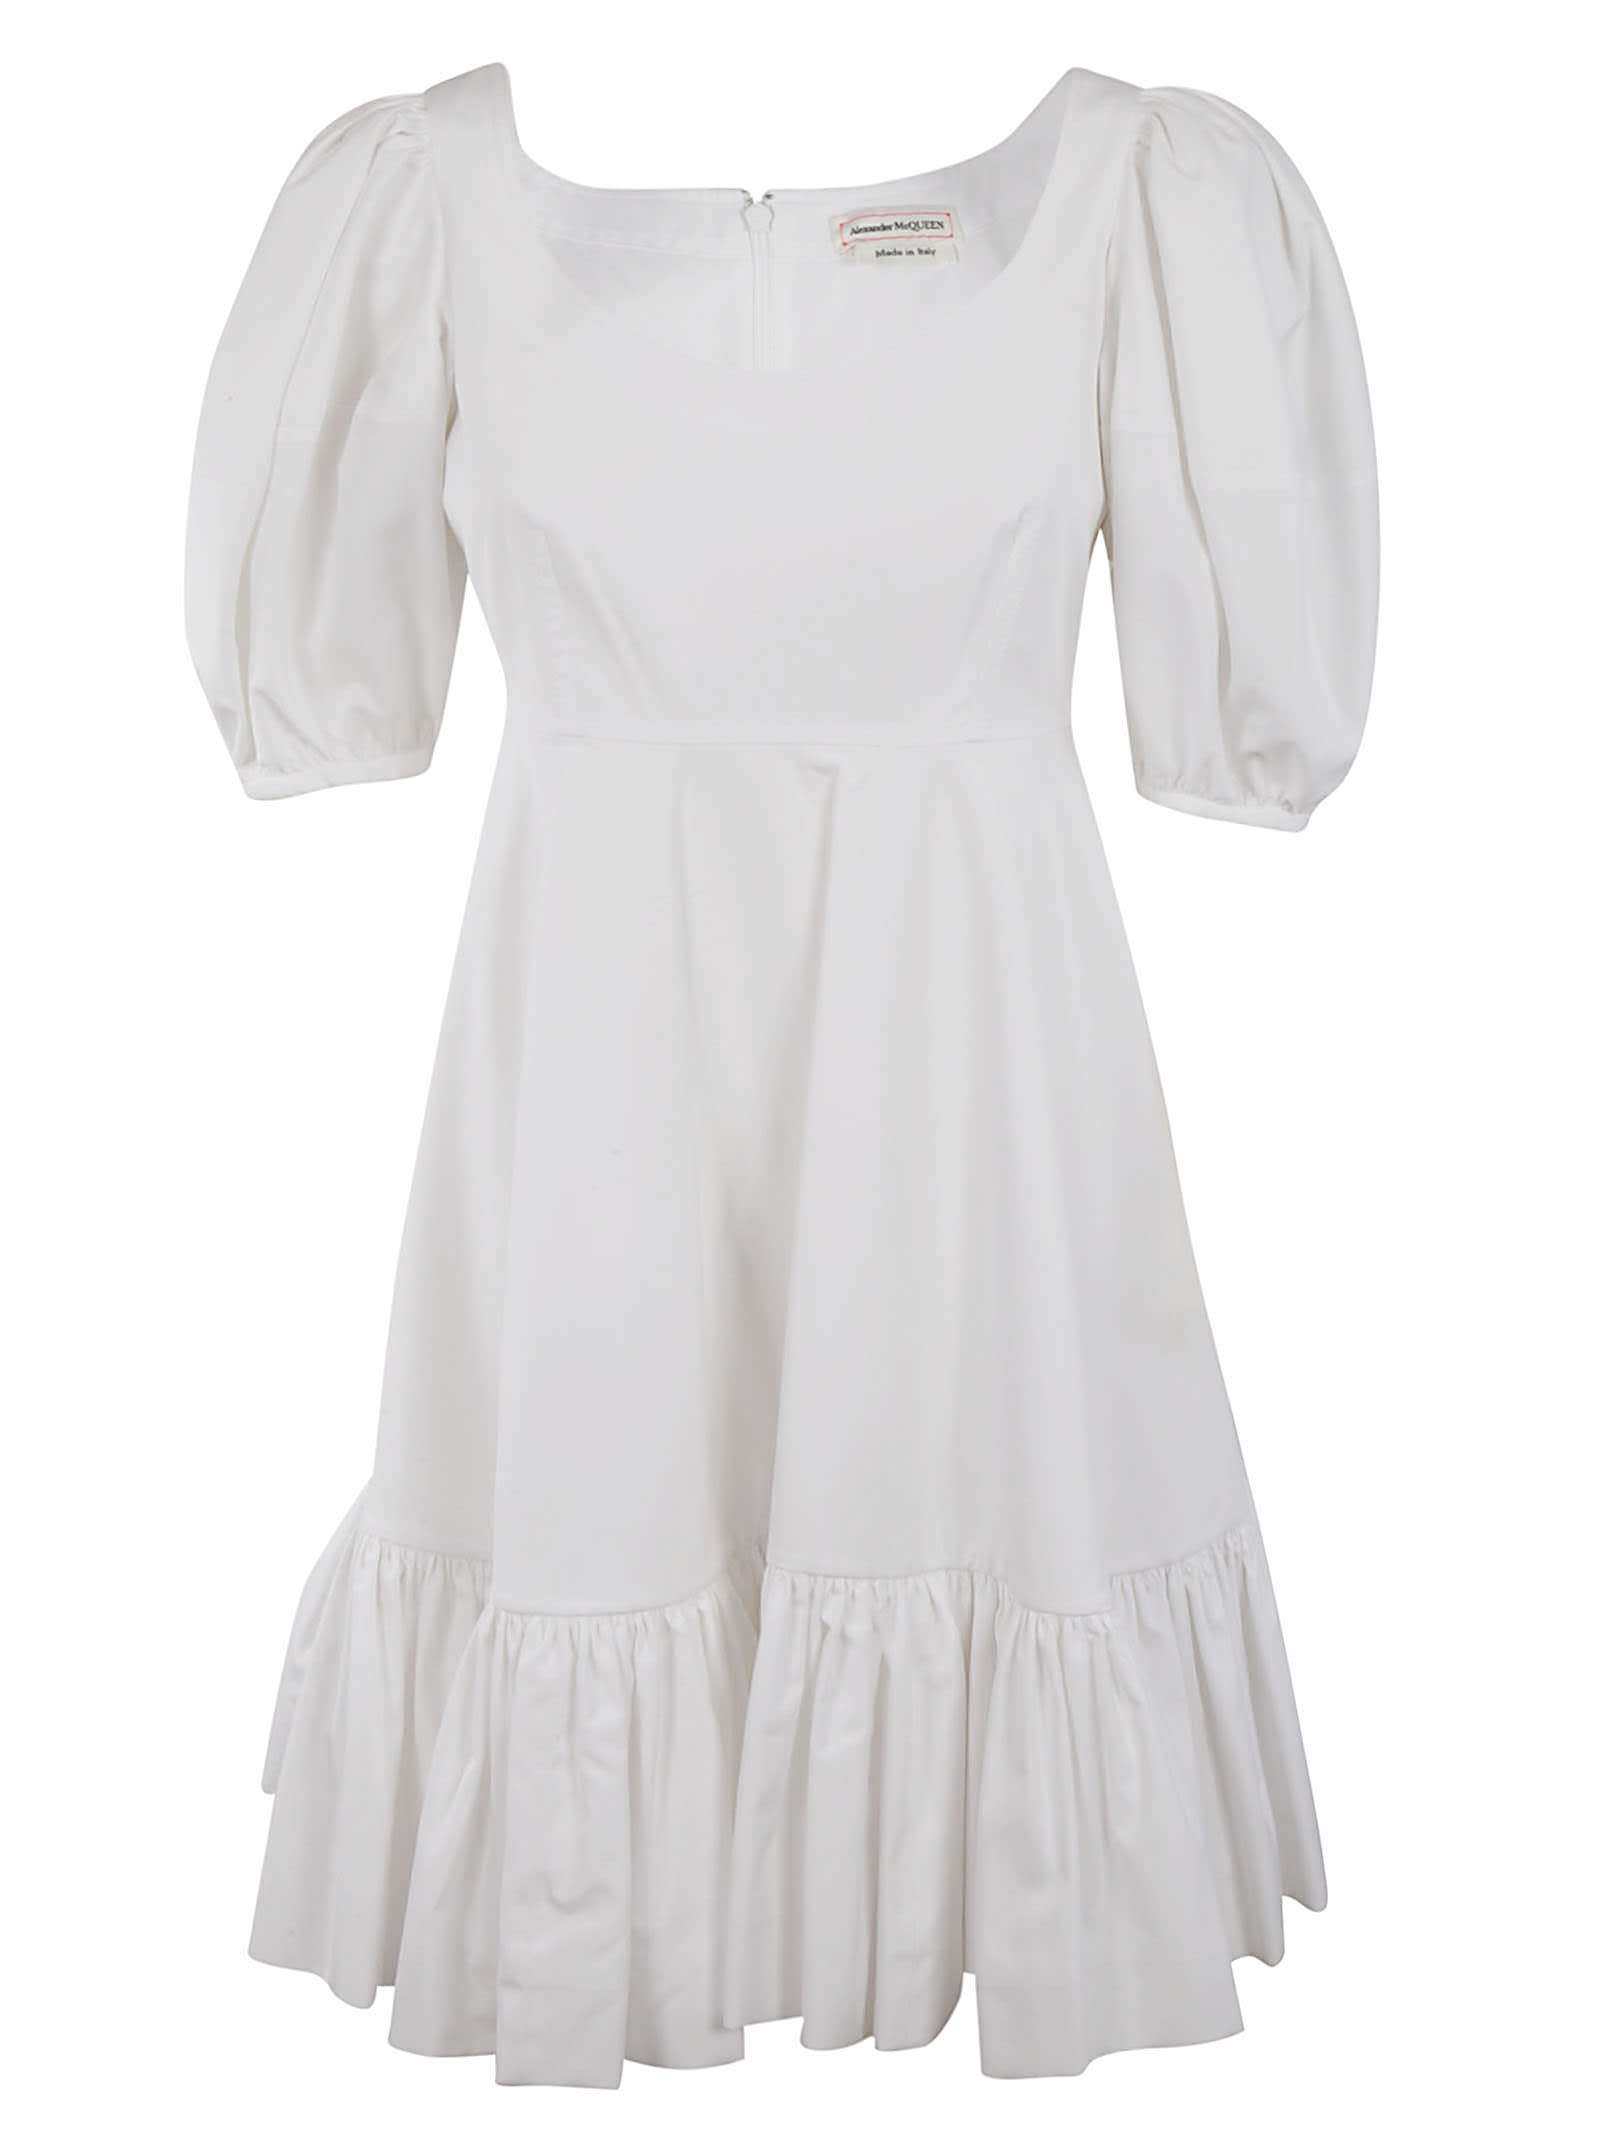 Buy Alexander McQueen Ruffled Skirt Mid-length Dress online, shop Alexander McQueen with free shipping